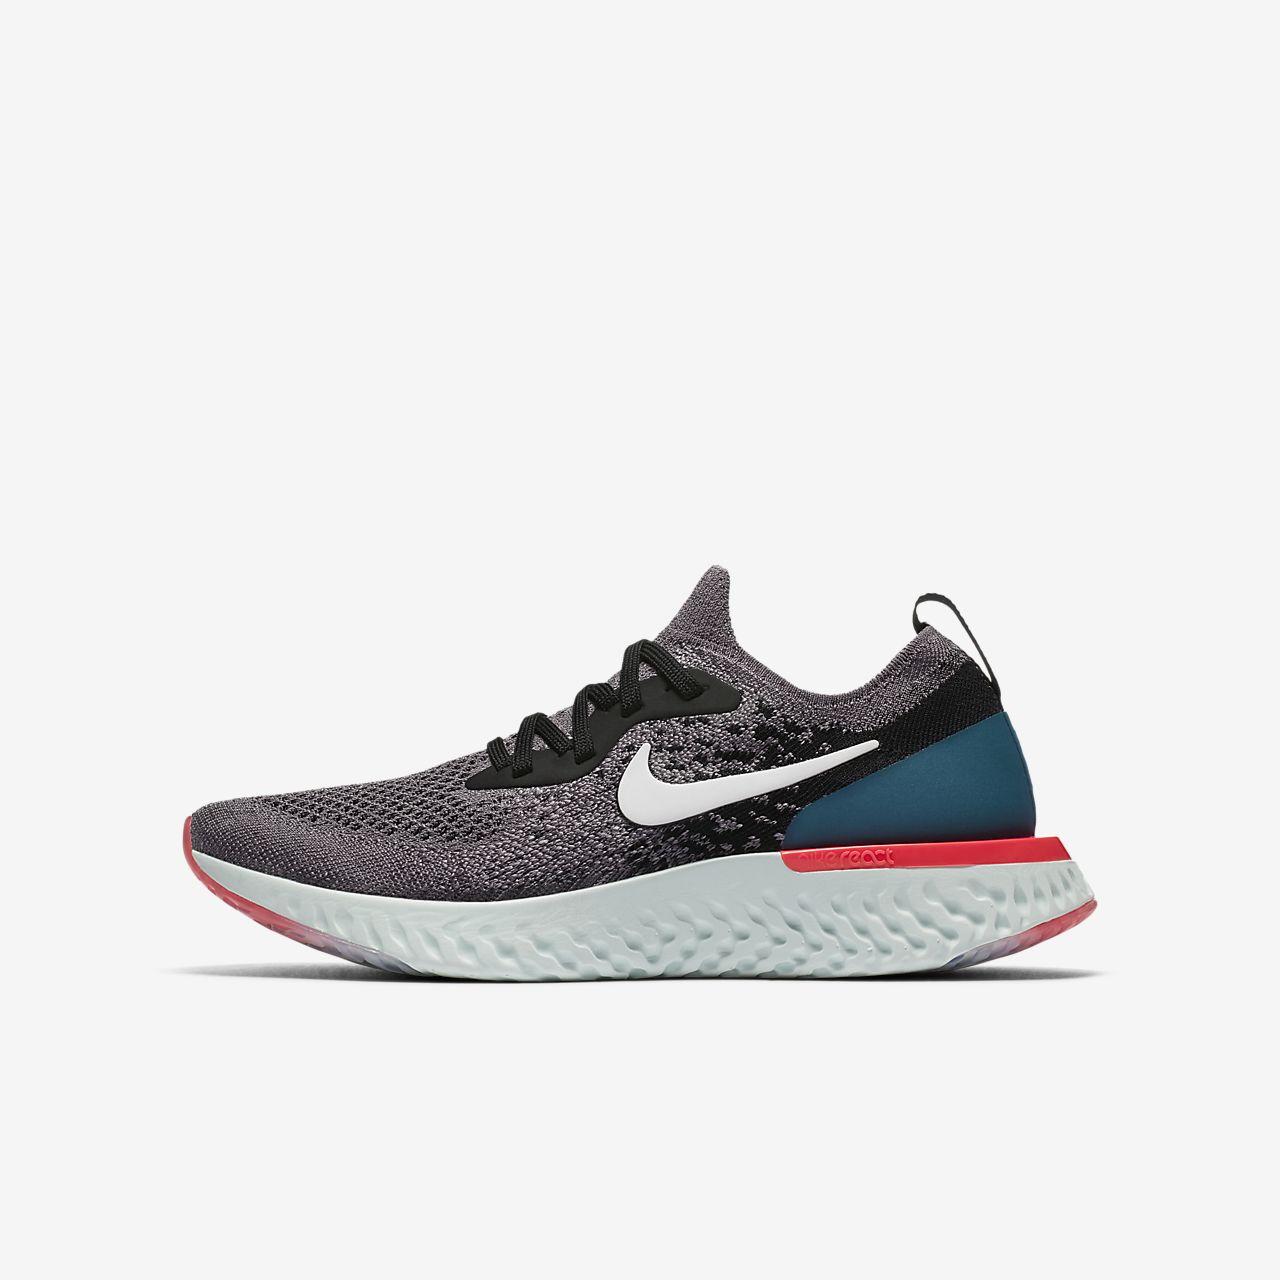 17b85d900b0 Nike Epic React Flyknit 1 Older Kids  Running Shoe. Nike.com DK